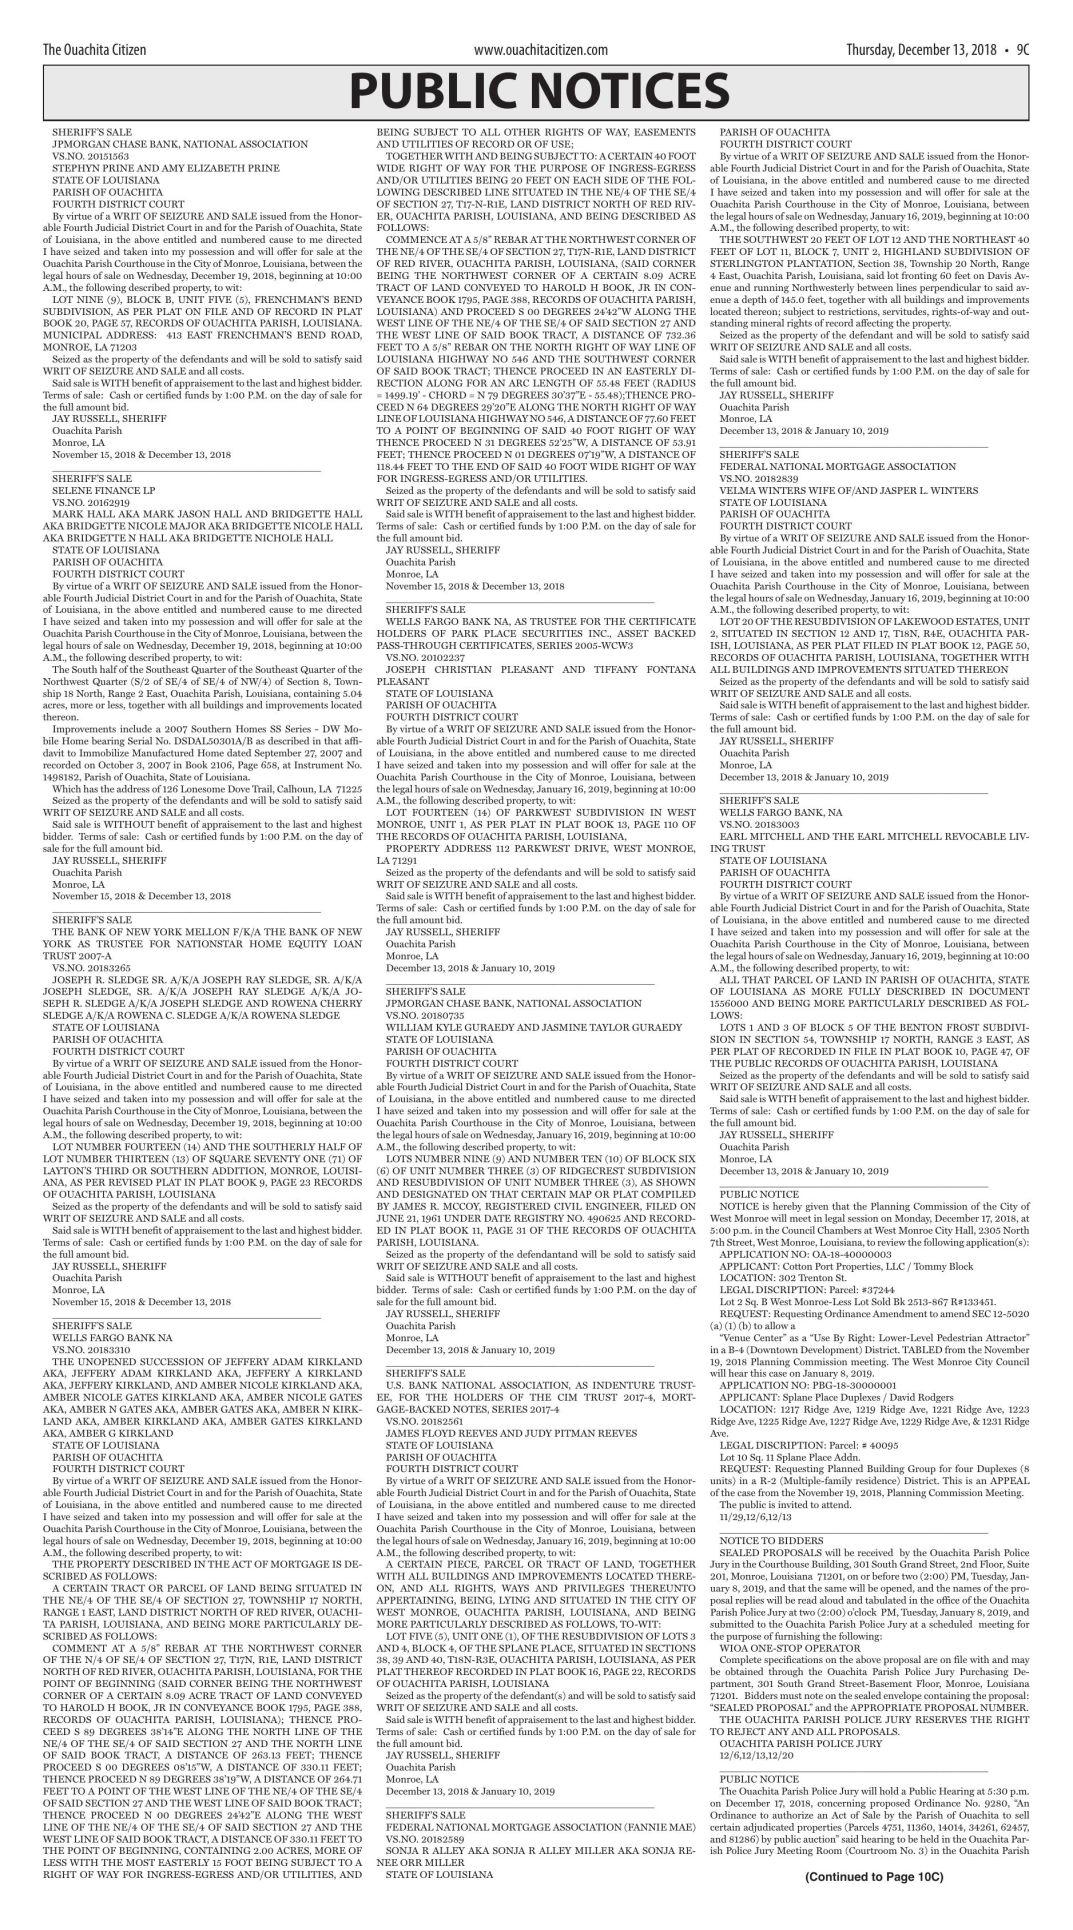 Dec. 13, 2018 Public Notices, click to download pages